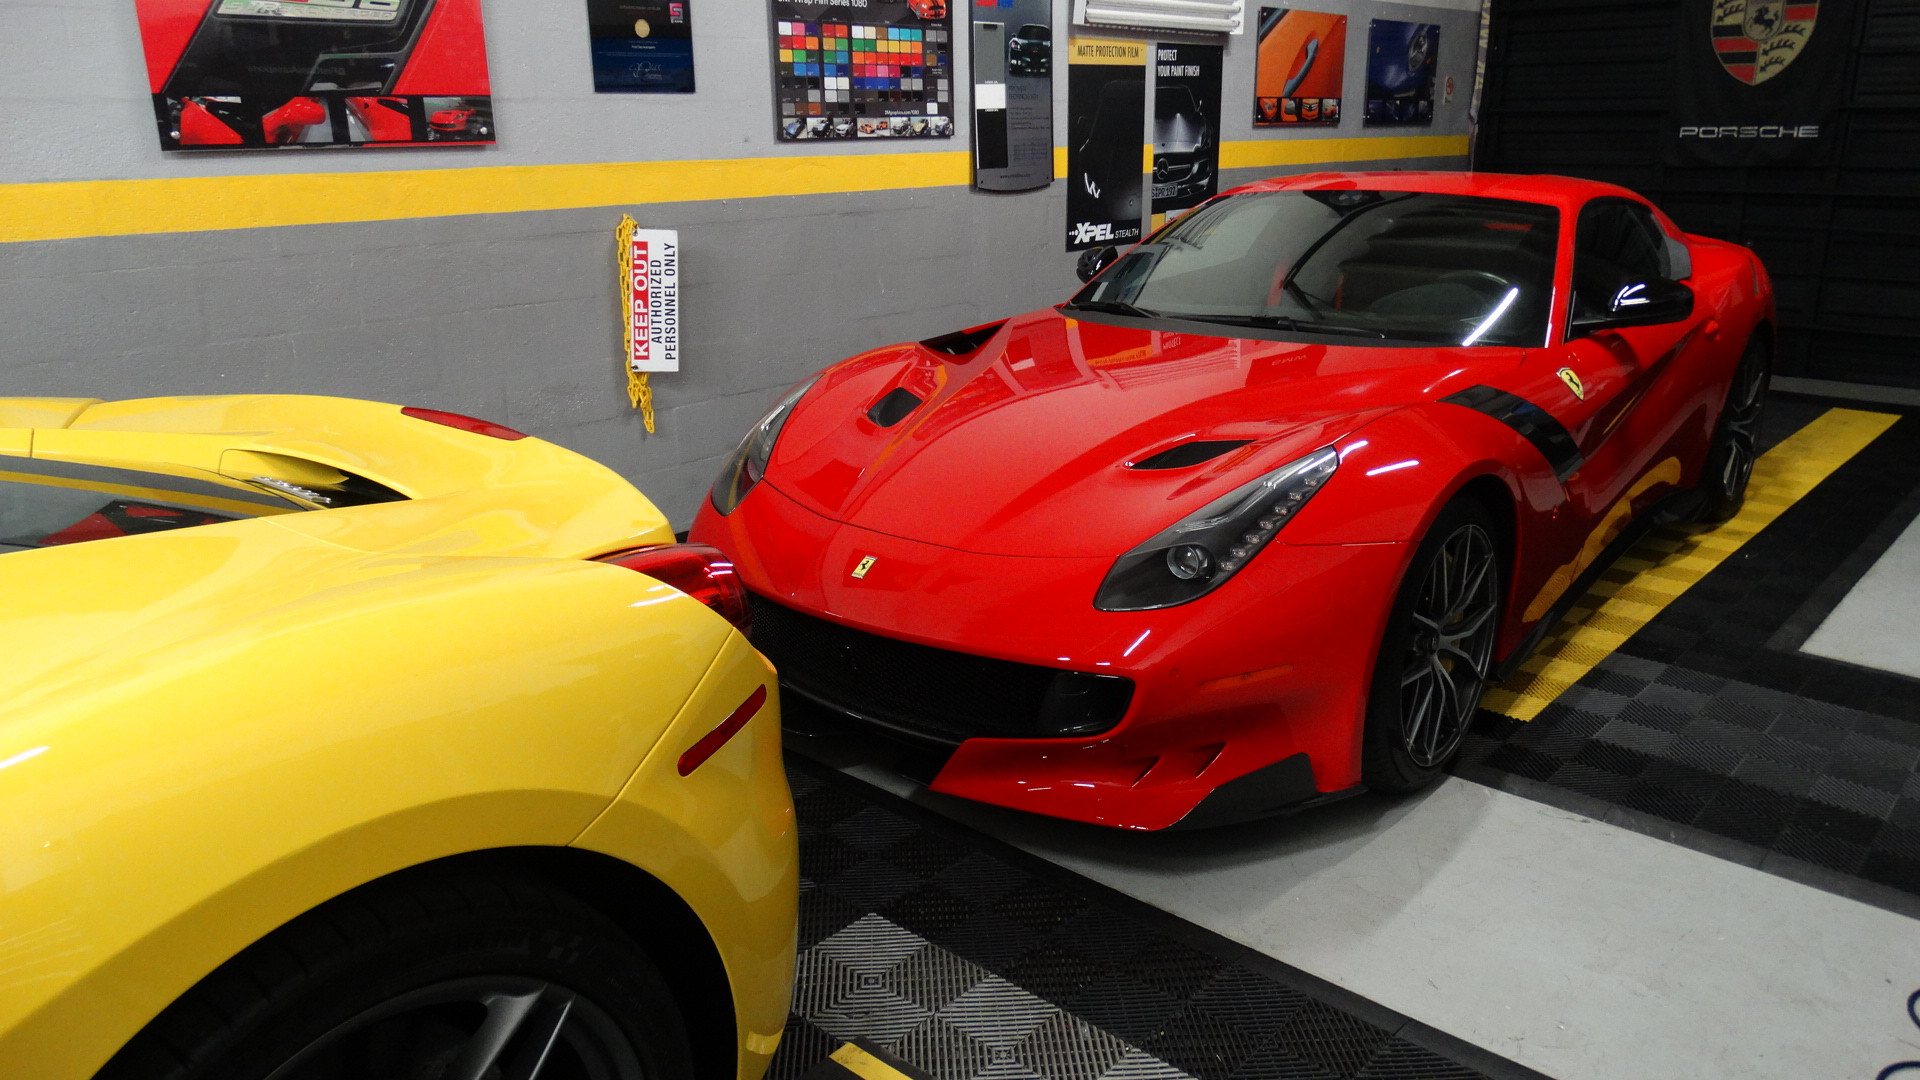 Ferrari day at First Class Autosports